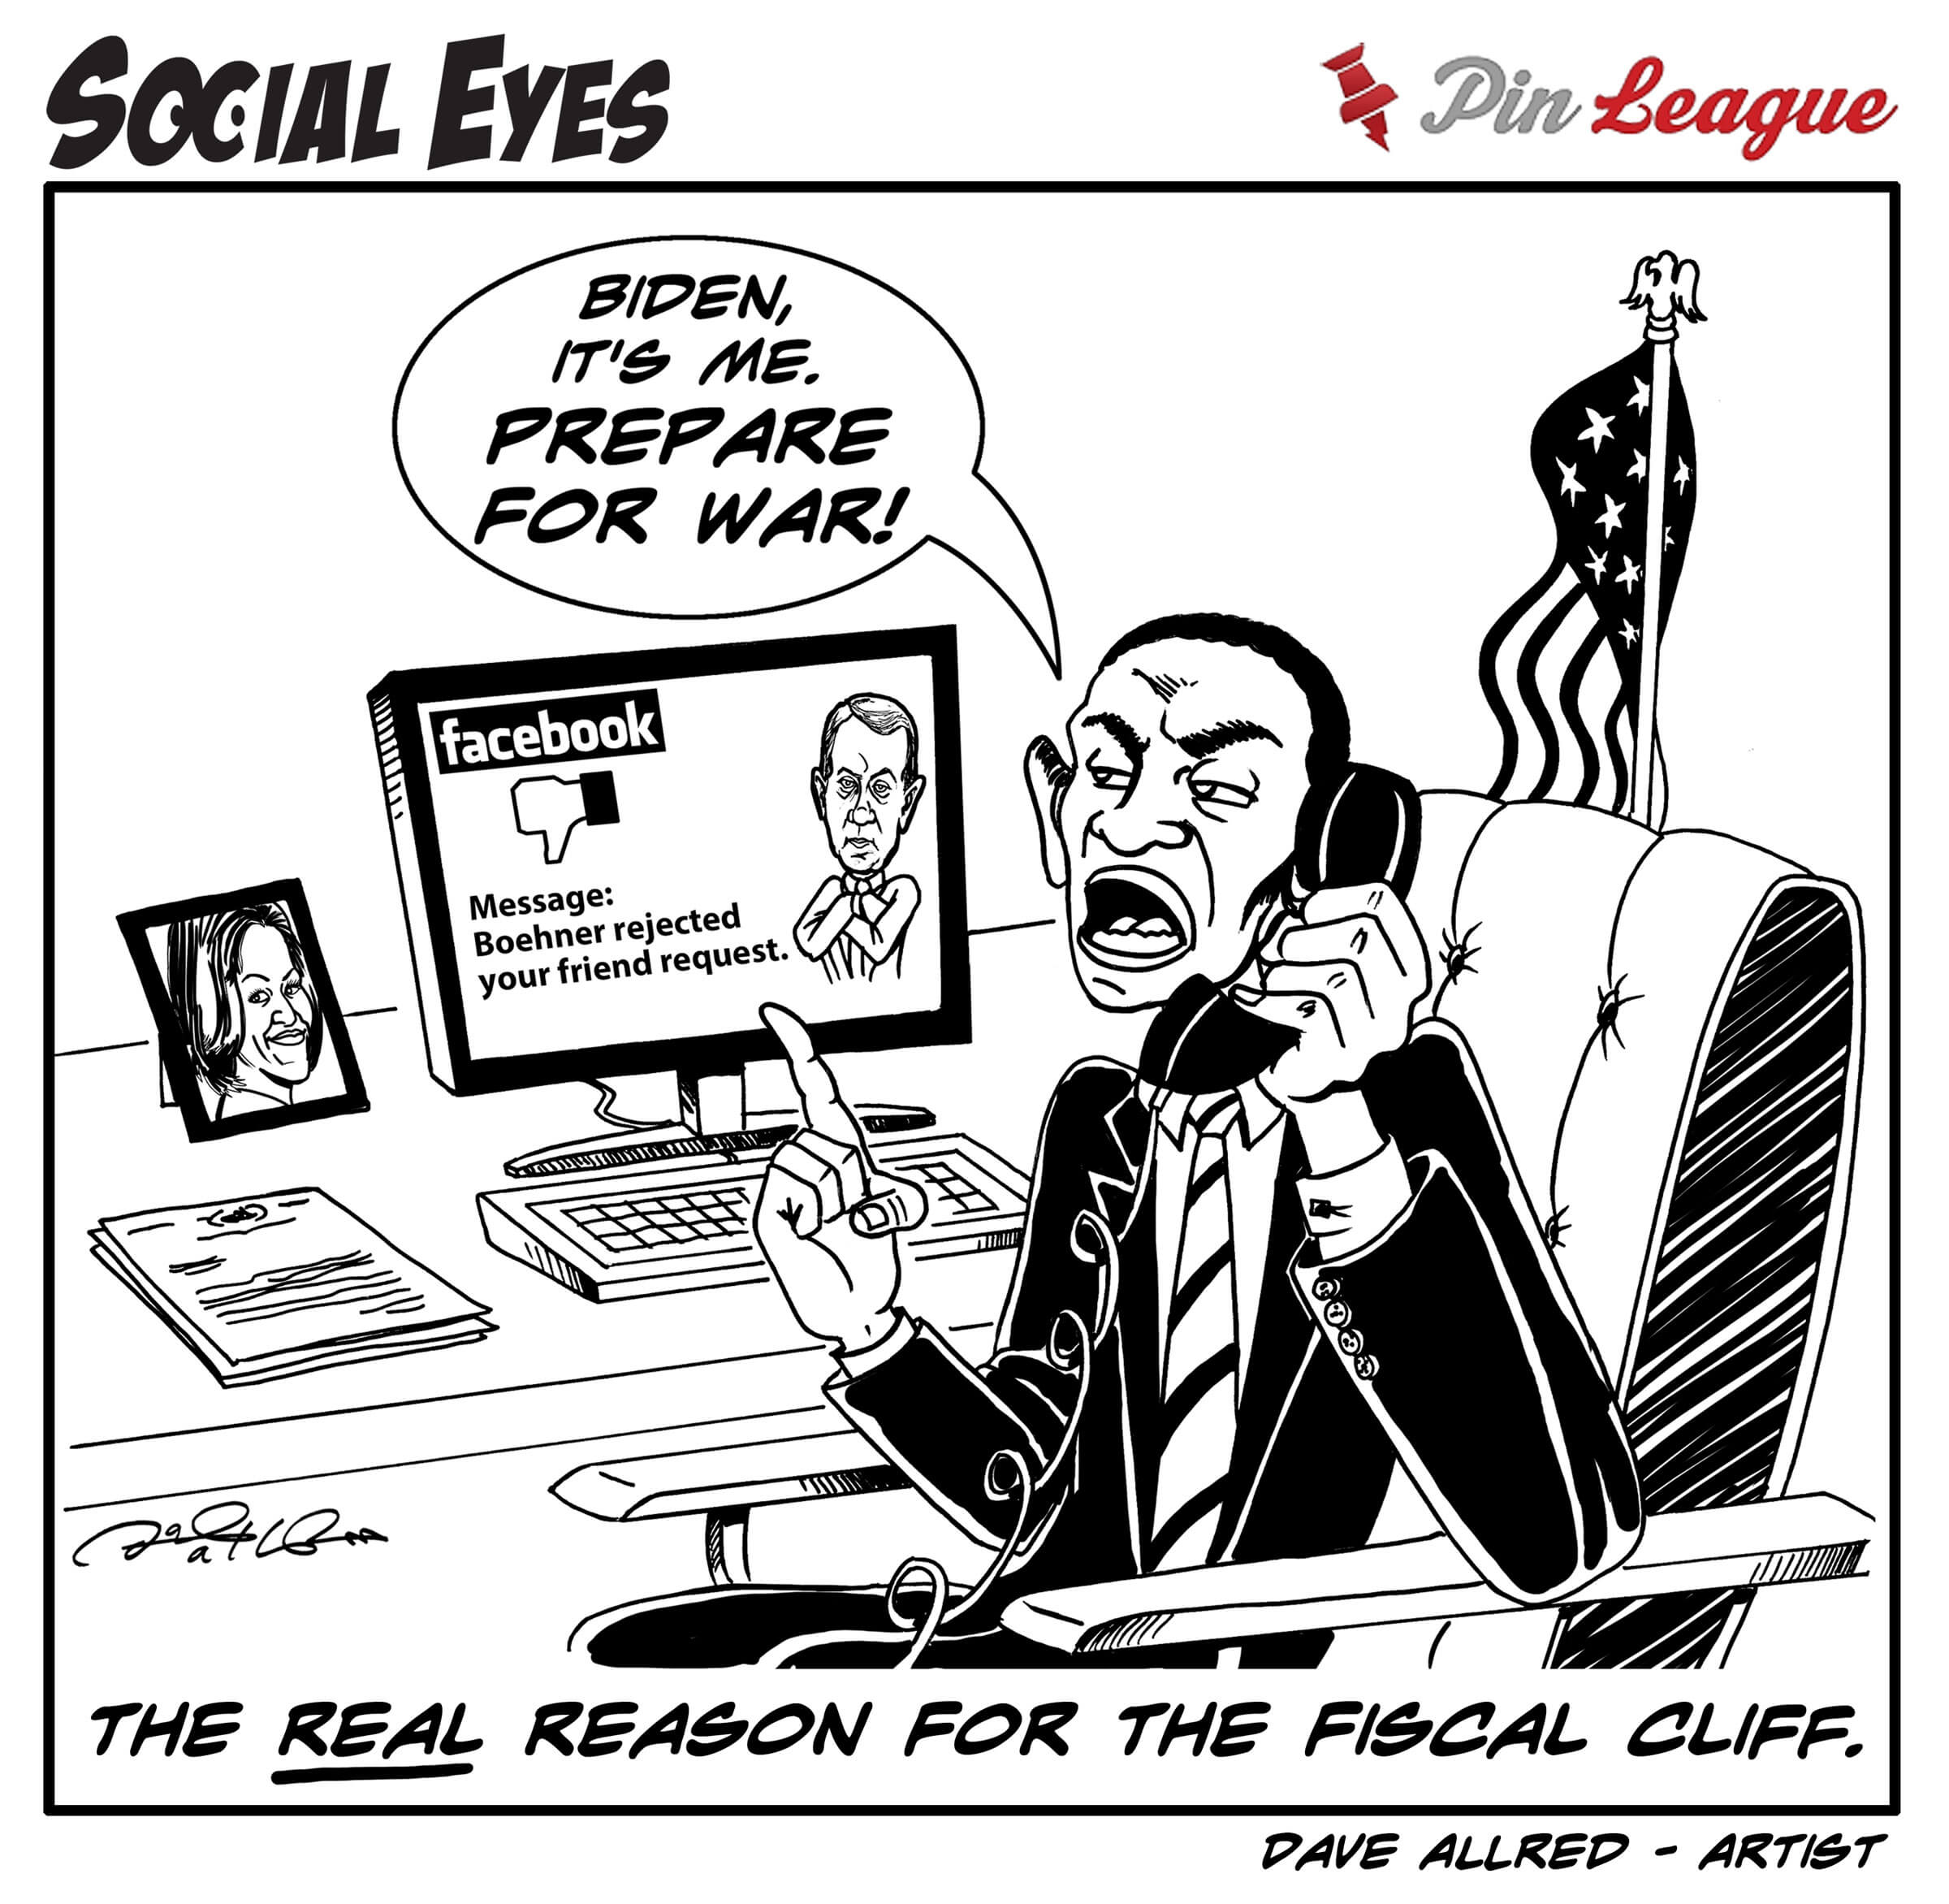 Funny Social Media Cartoon Strip by PinLeague